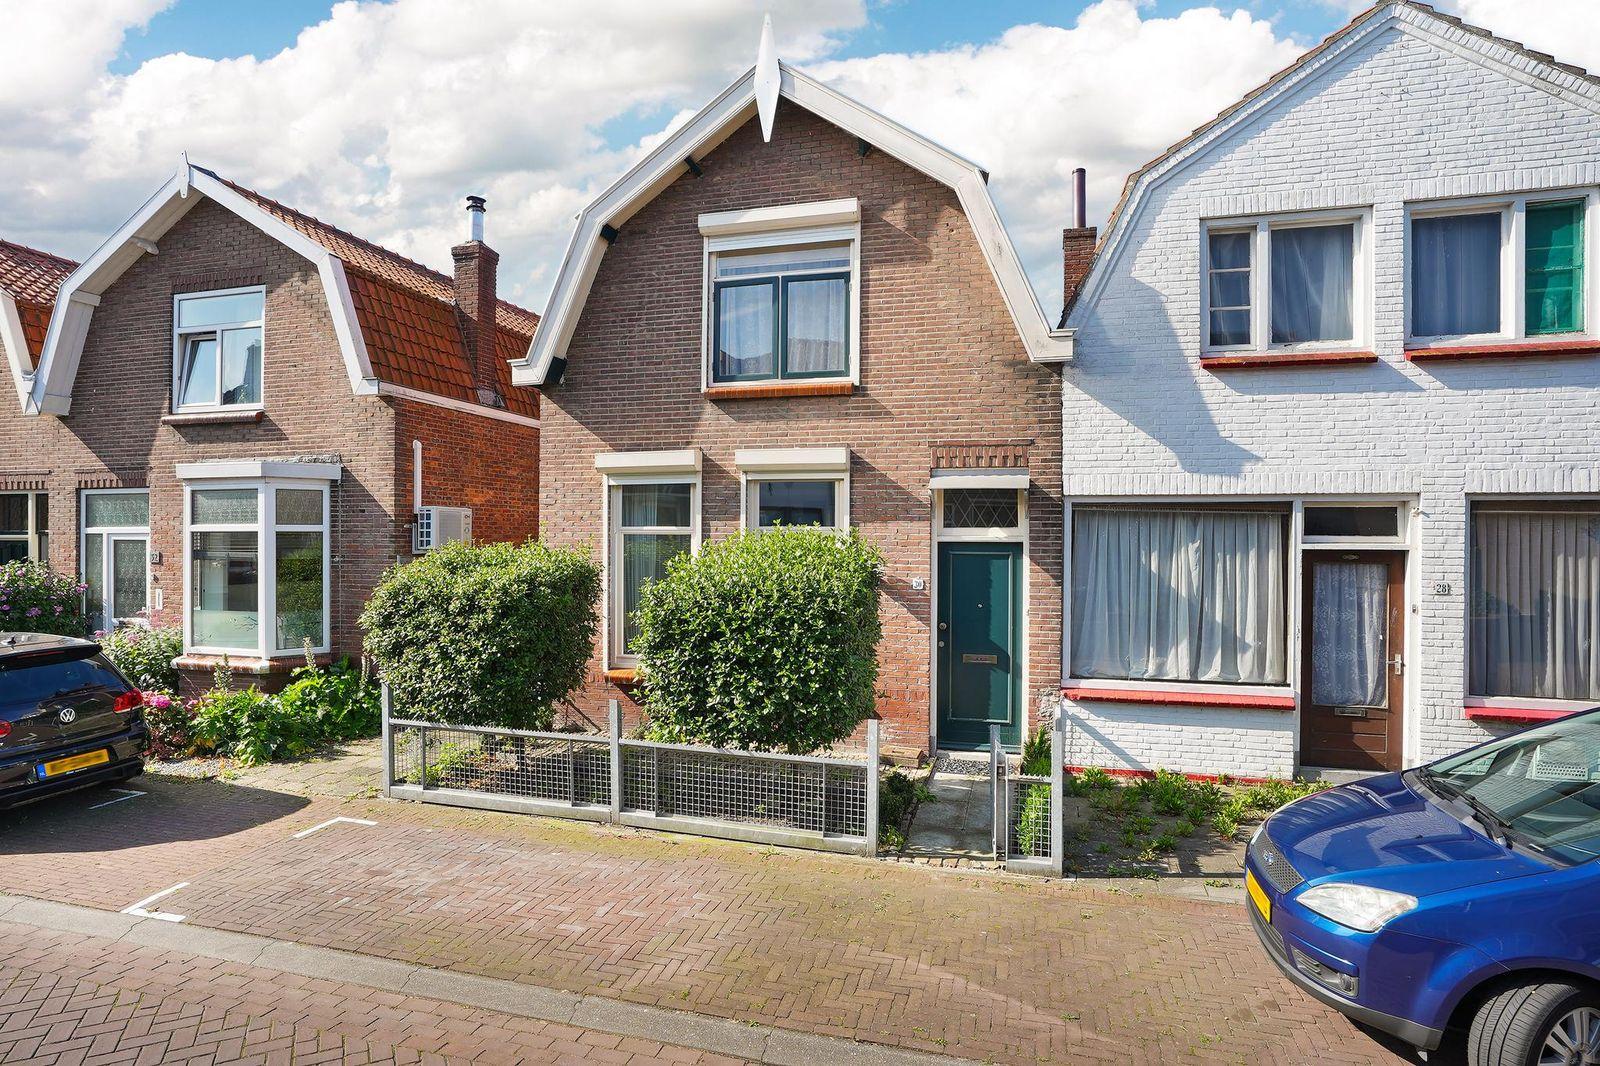 J.I. Sandersestraat 30, Oost-souburg